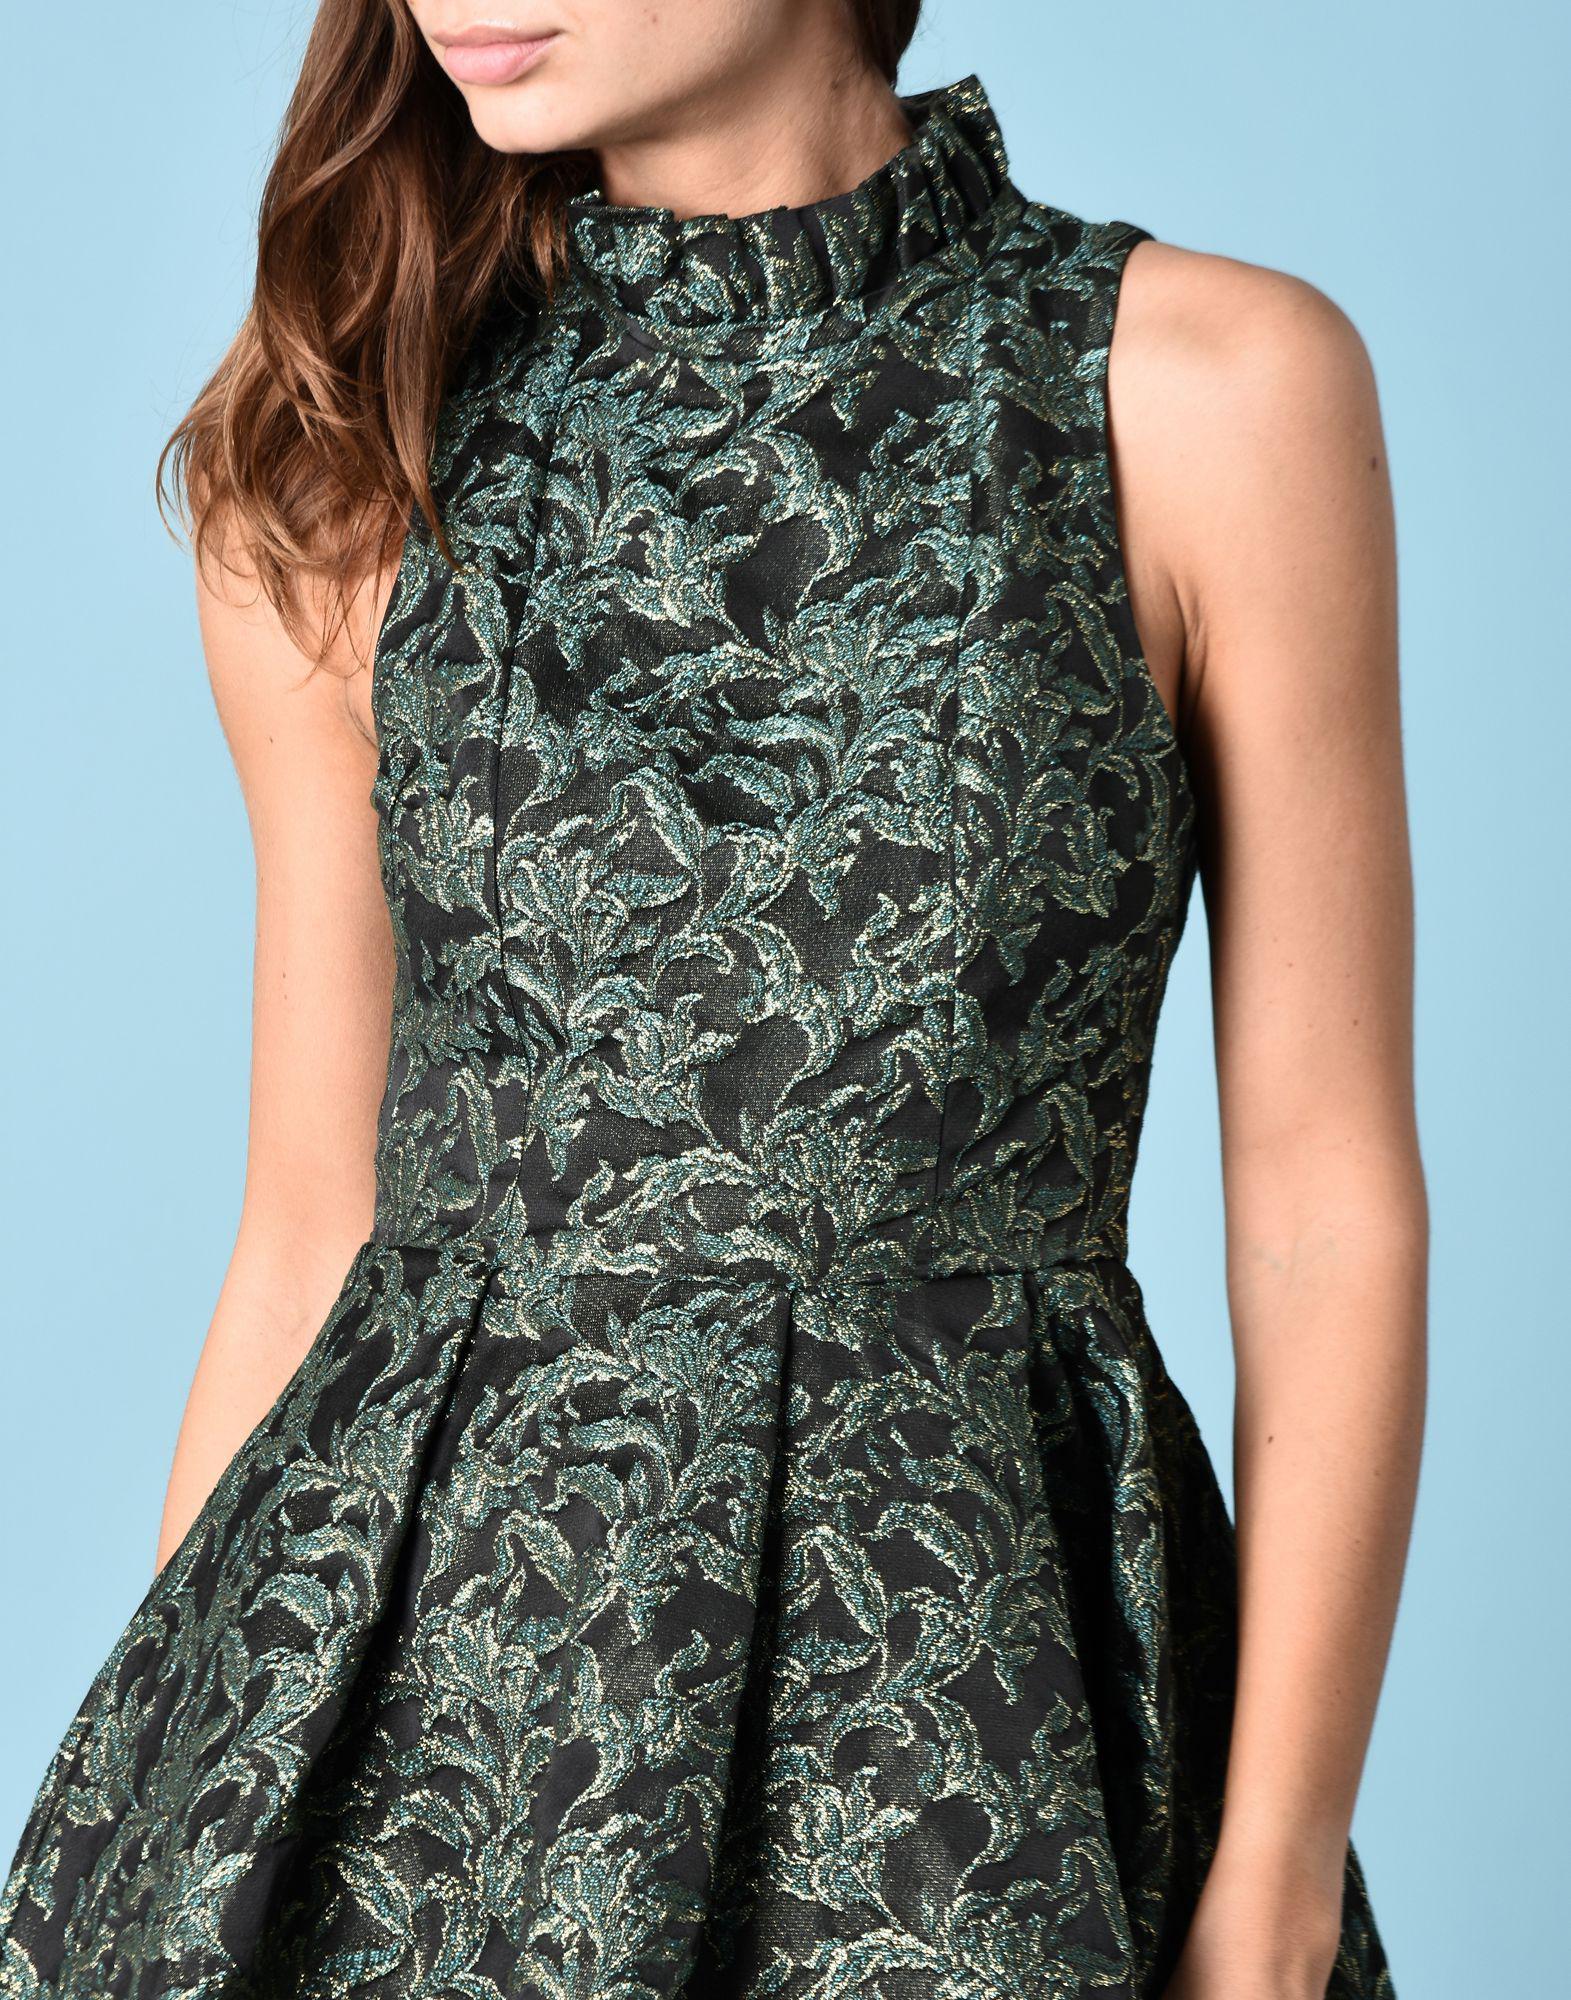 Minivestido Jolie By Edward Spiers de Tejido sintético de color Verde